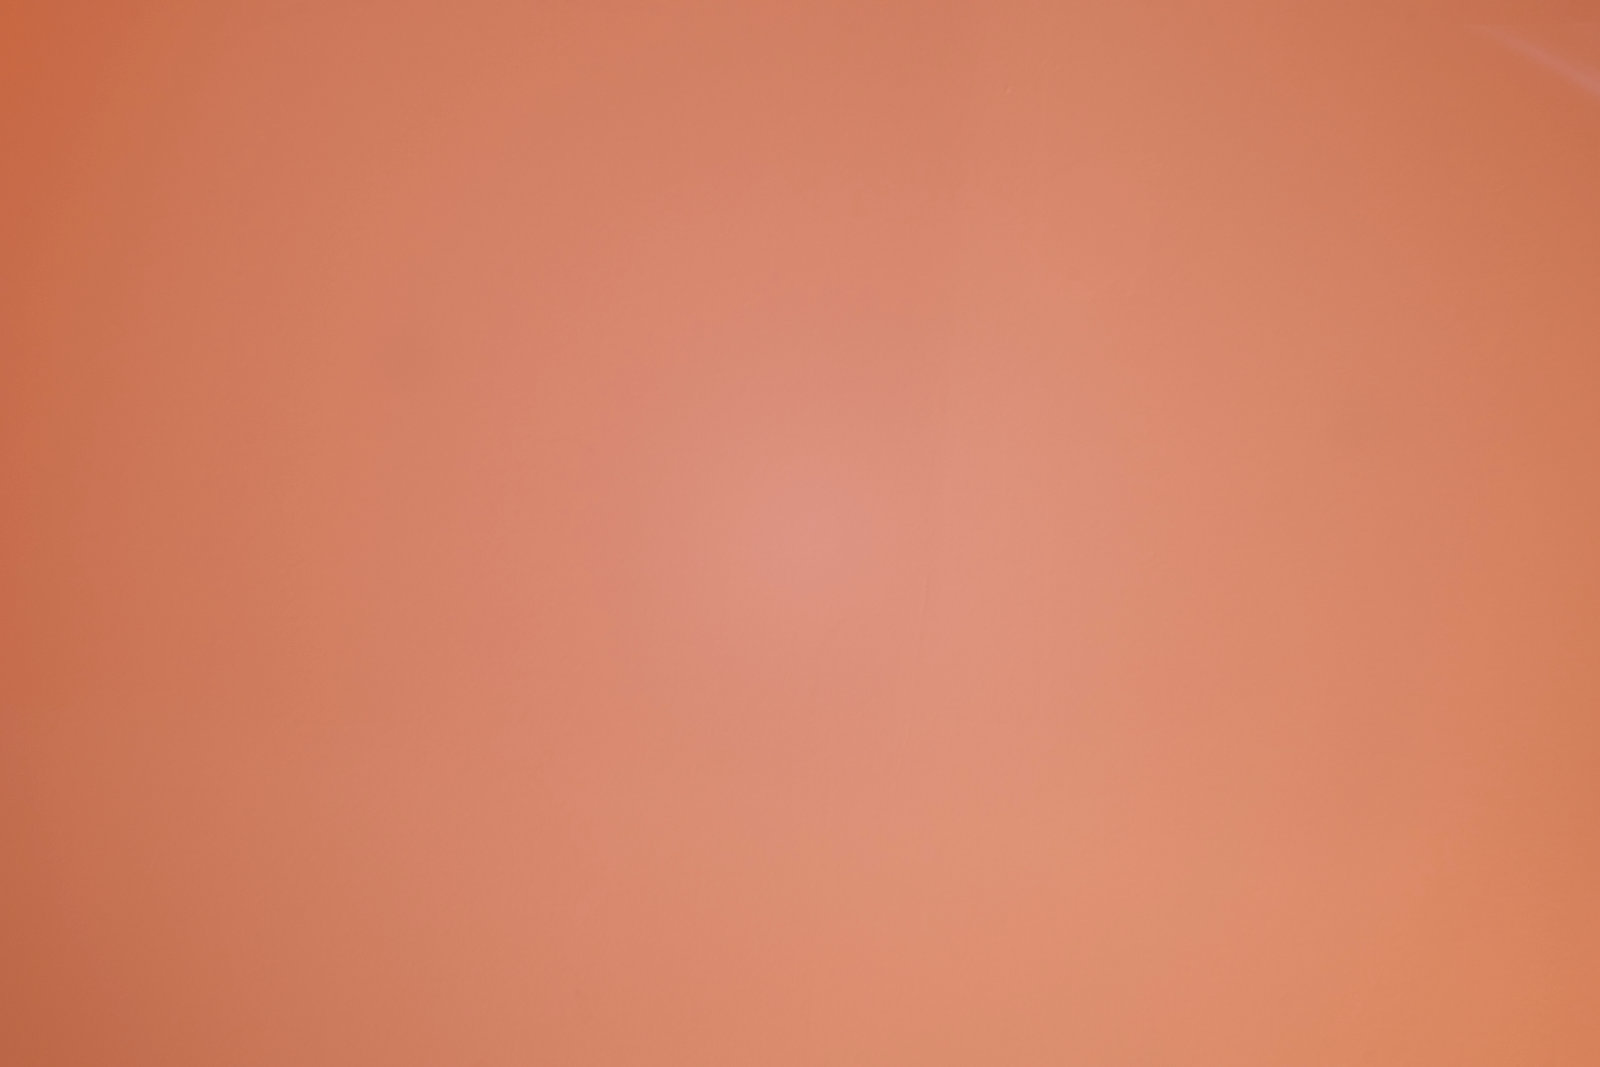 test infrarouge HOTSPOT 24mm F11 SIGMA | Pierre-Louis Ferrer | Test du SIGMA 24mm F/1.4 DG HSM Art en photographie infrarouge | Partie 1